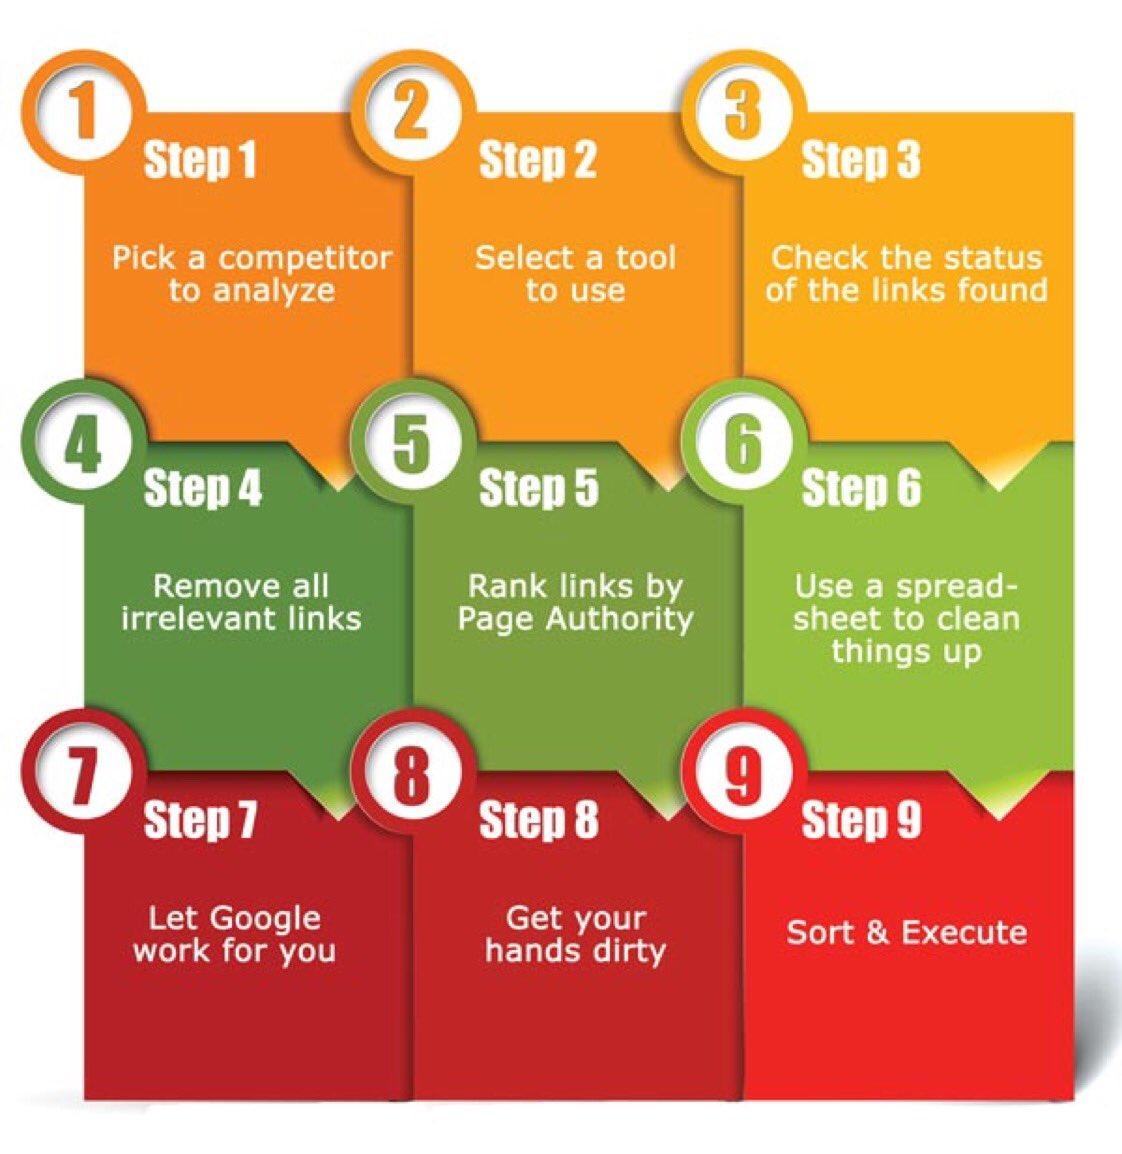 Get SEO perfected! #DigitalTransformation  #DigitalMarketing #Sales #Contentmarketing #Branding #SEO #Startup #GrowthHacking #Content #Marketing #SocialMedia #Defstar5 #Mpgvip #OnlineMarketing #SocialMediaMarketing #SMM #SEO #SMM #Marketing #blog<br>http://pic.twitter.com/dYVq6mzgdf